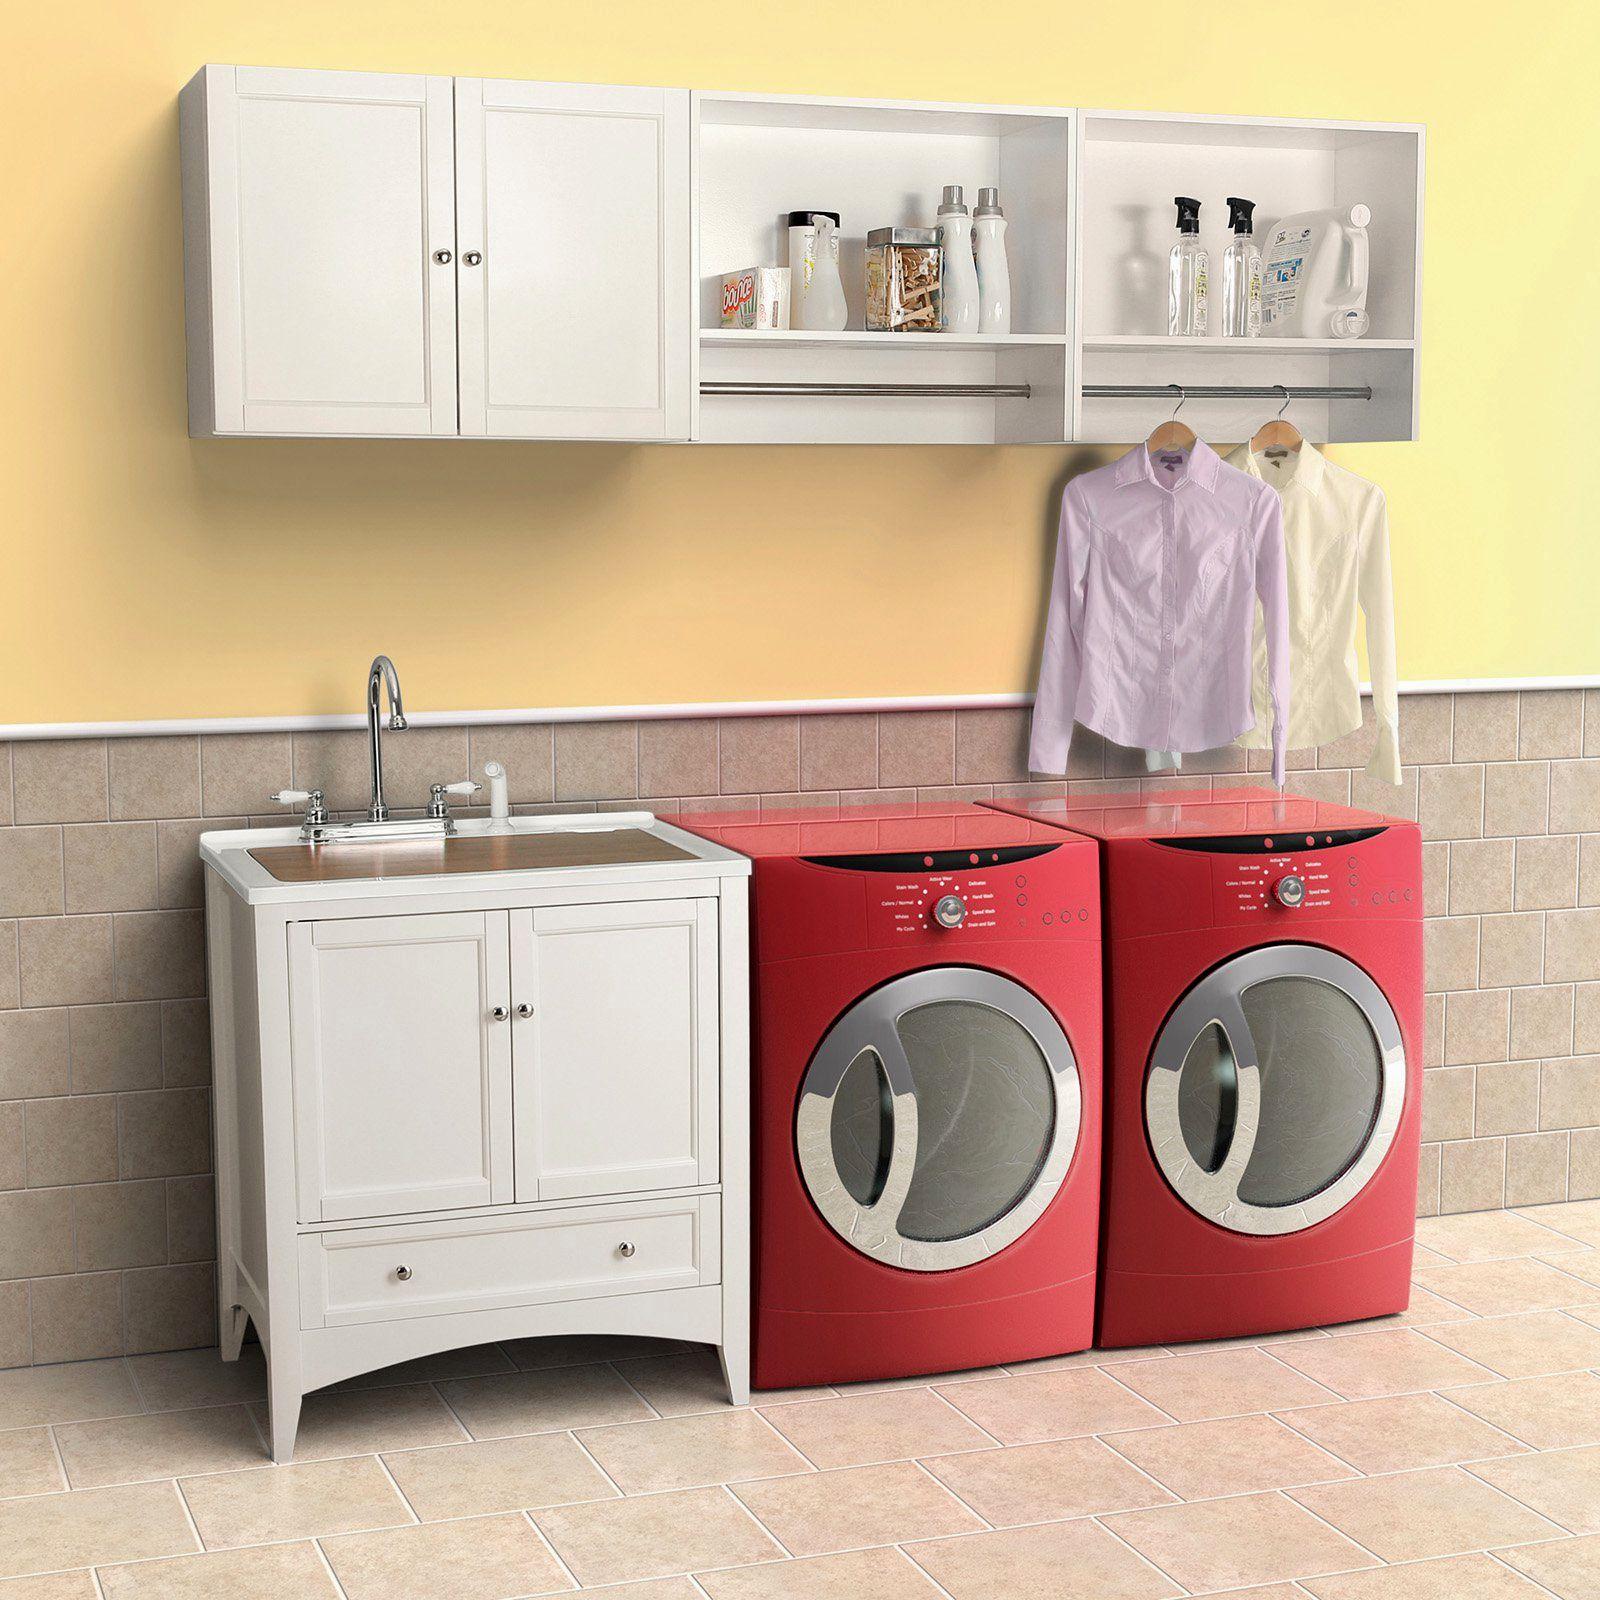 new white bathroom vanity home depot plan-Contemporary White Bathroom Vanity Home Depot Layout